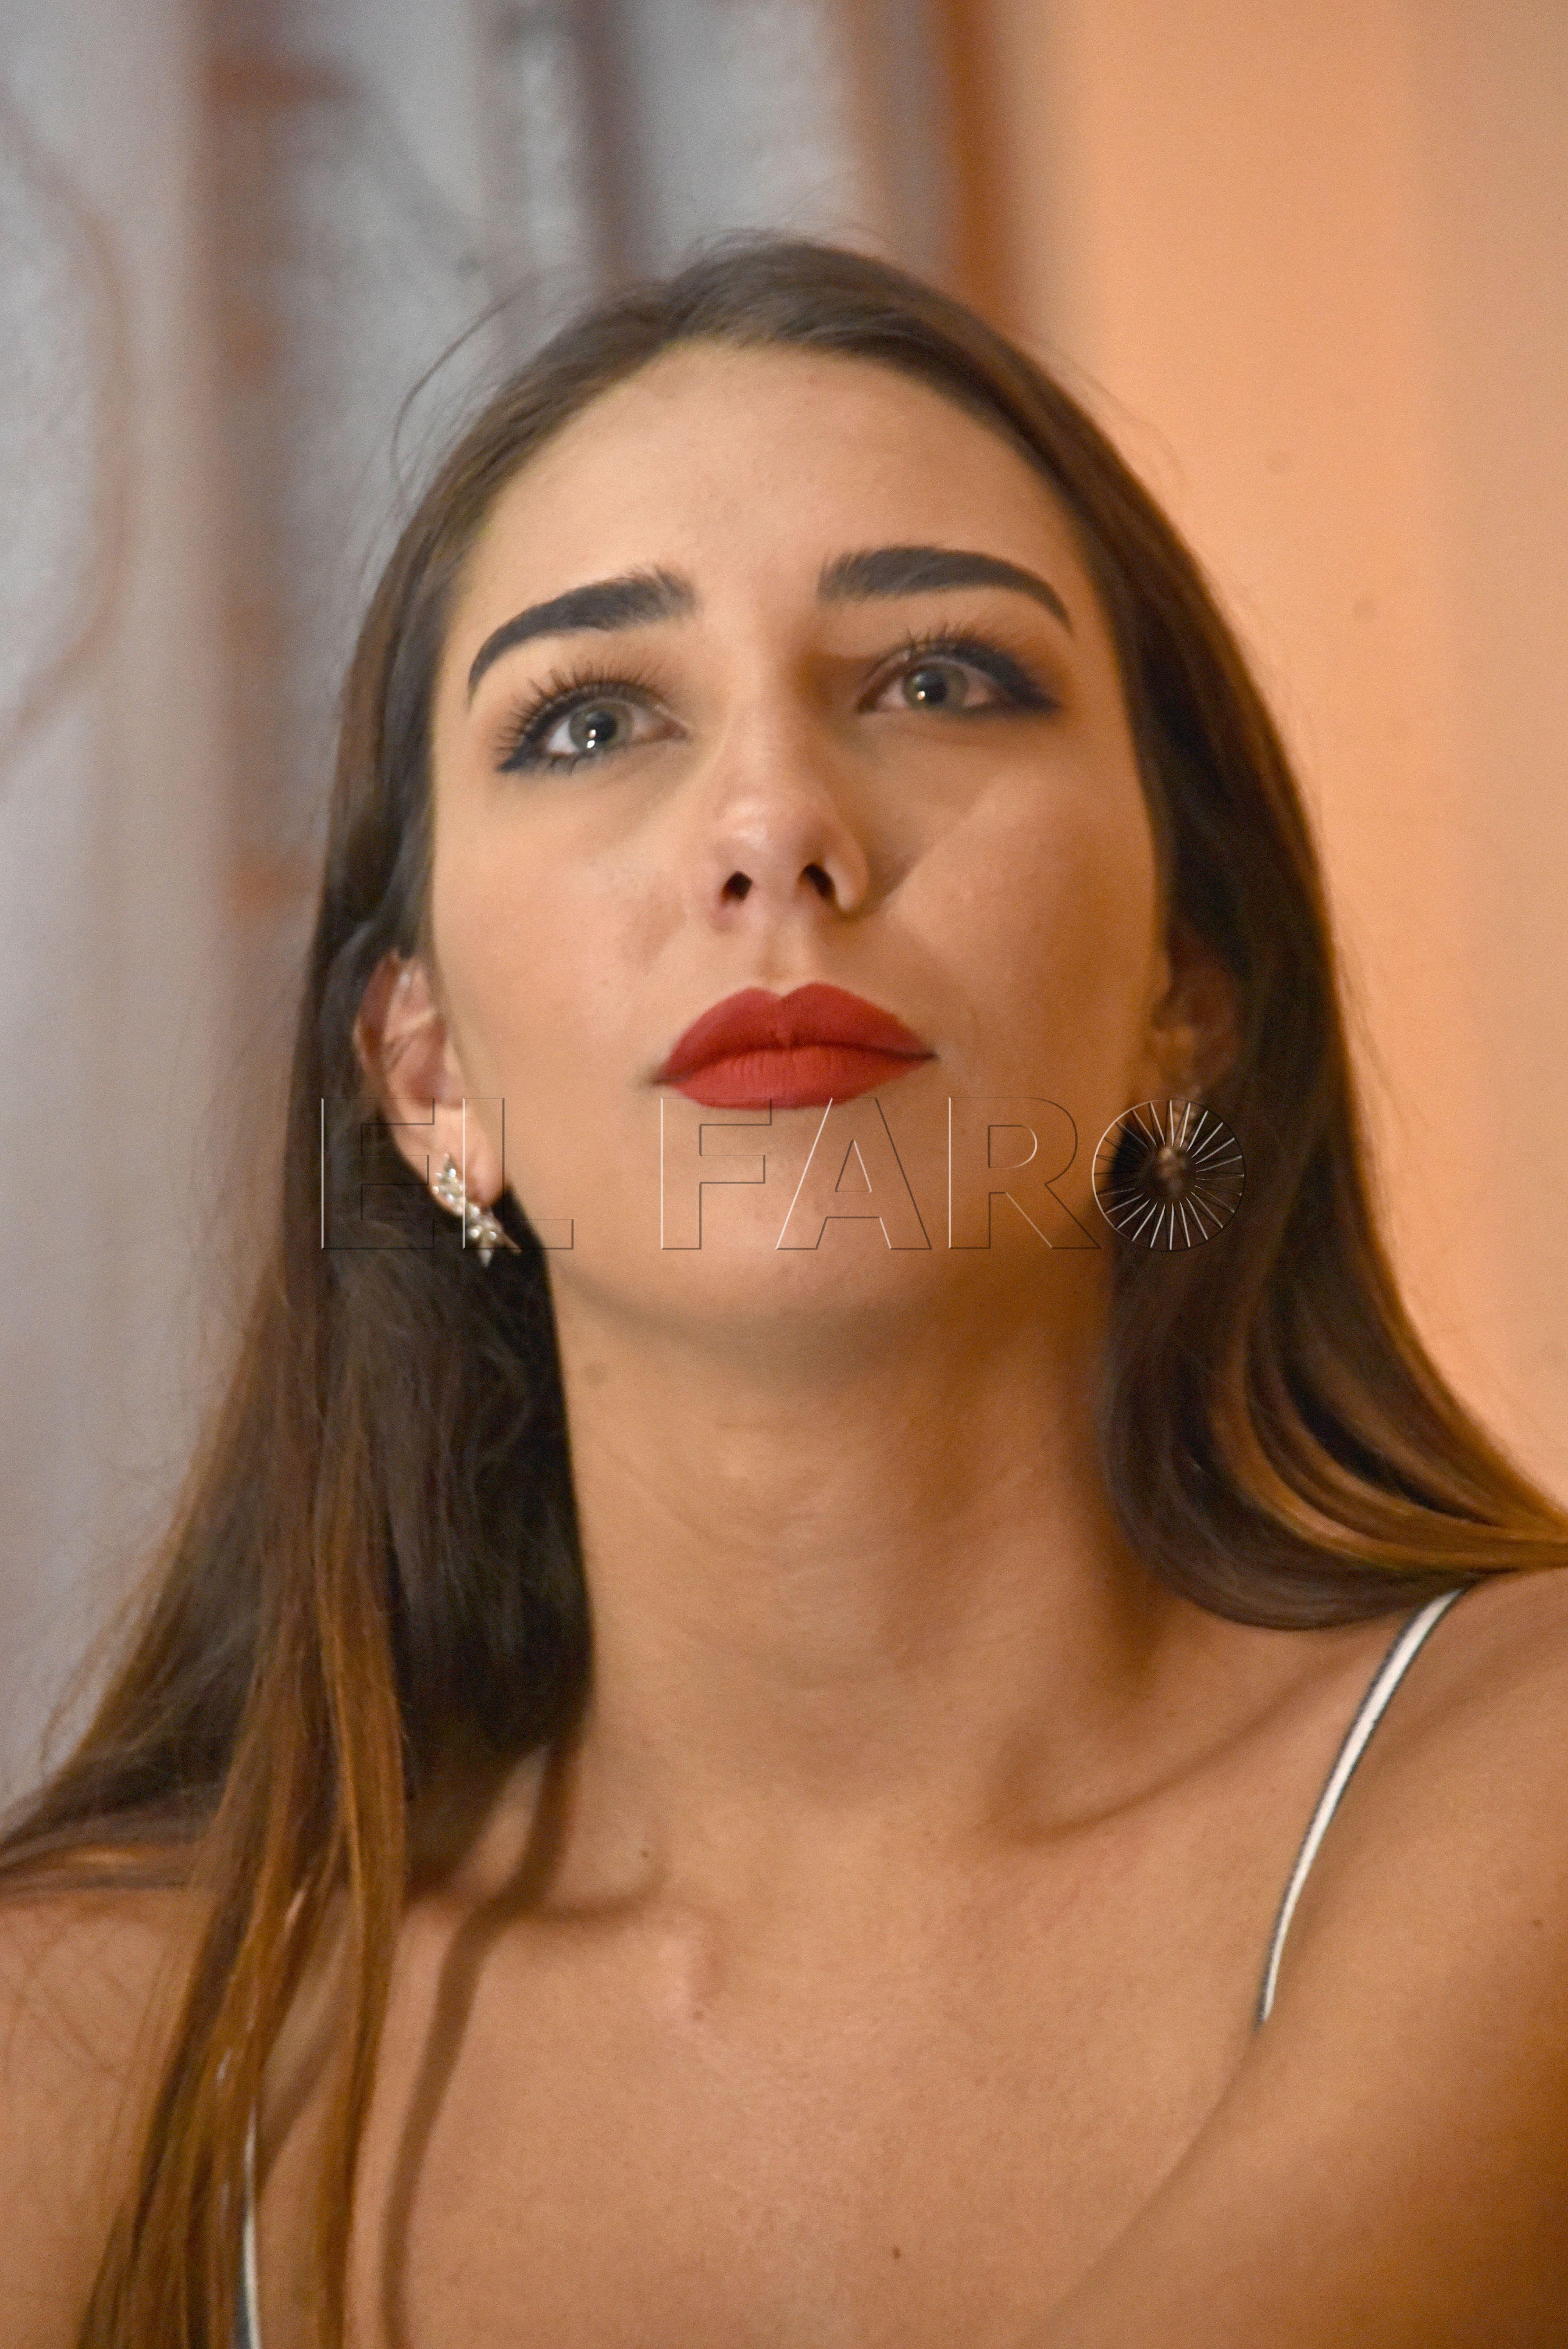 Feminista, futura guardia civil y modelo: Sara Martínez, la candidata ceutí a Miss Mundo 2019 1sLrUW